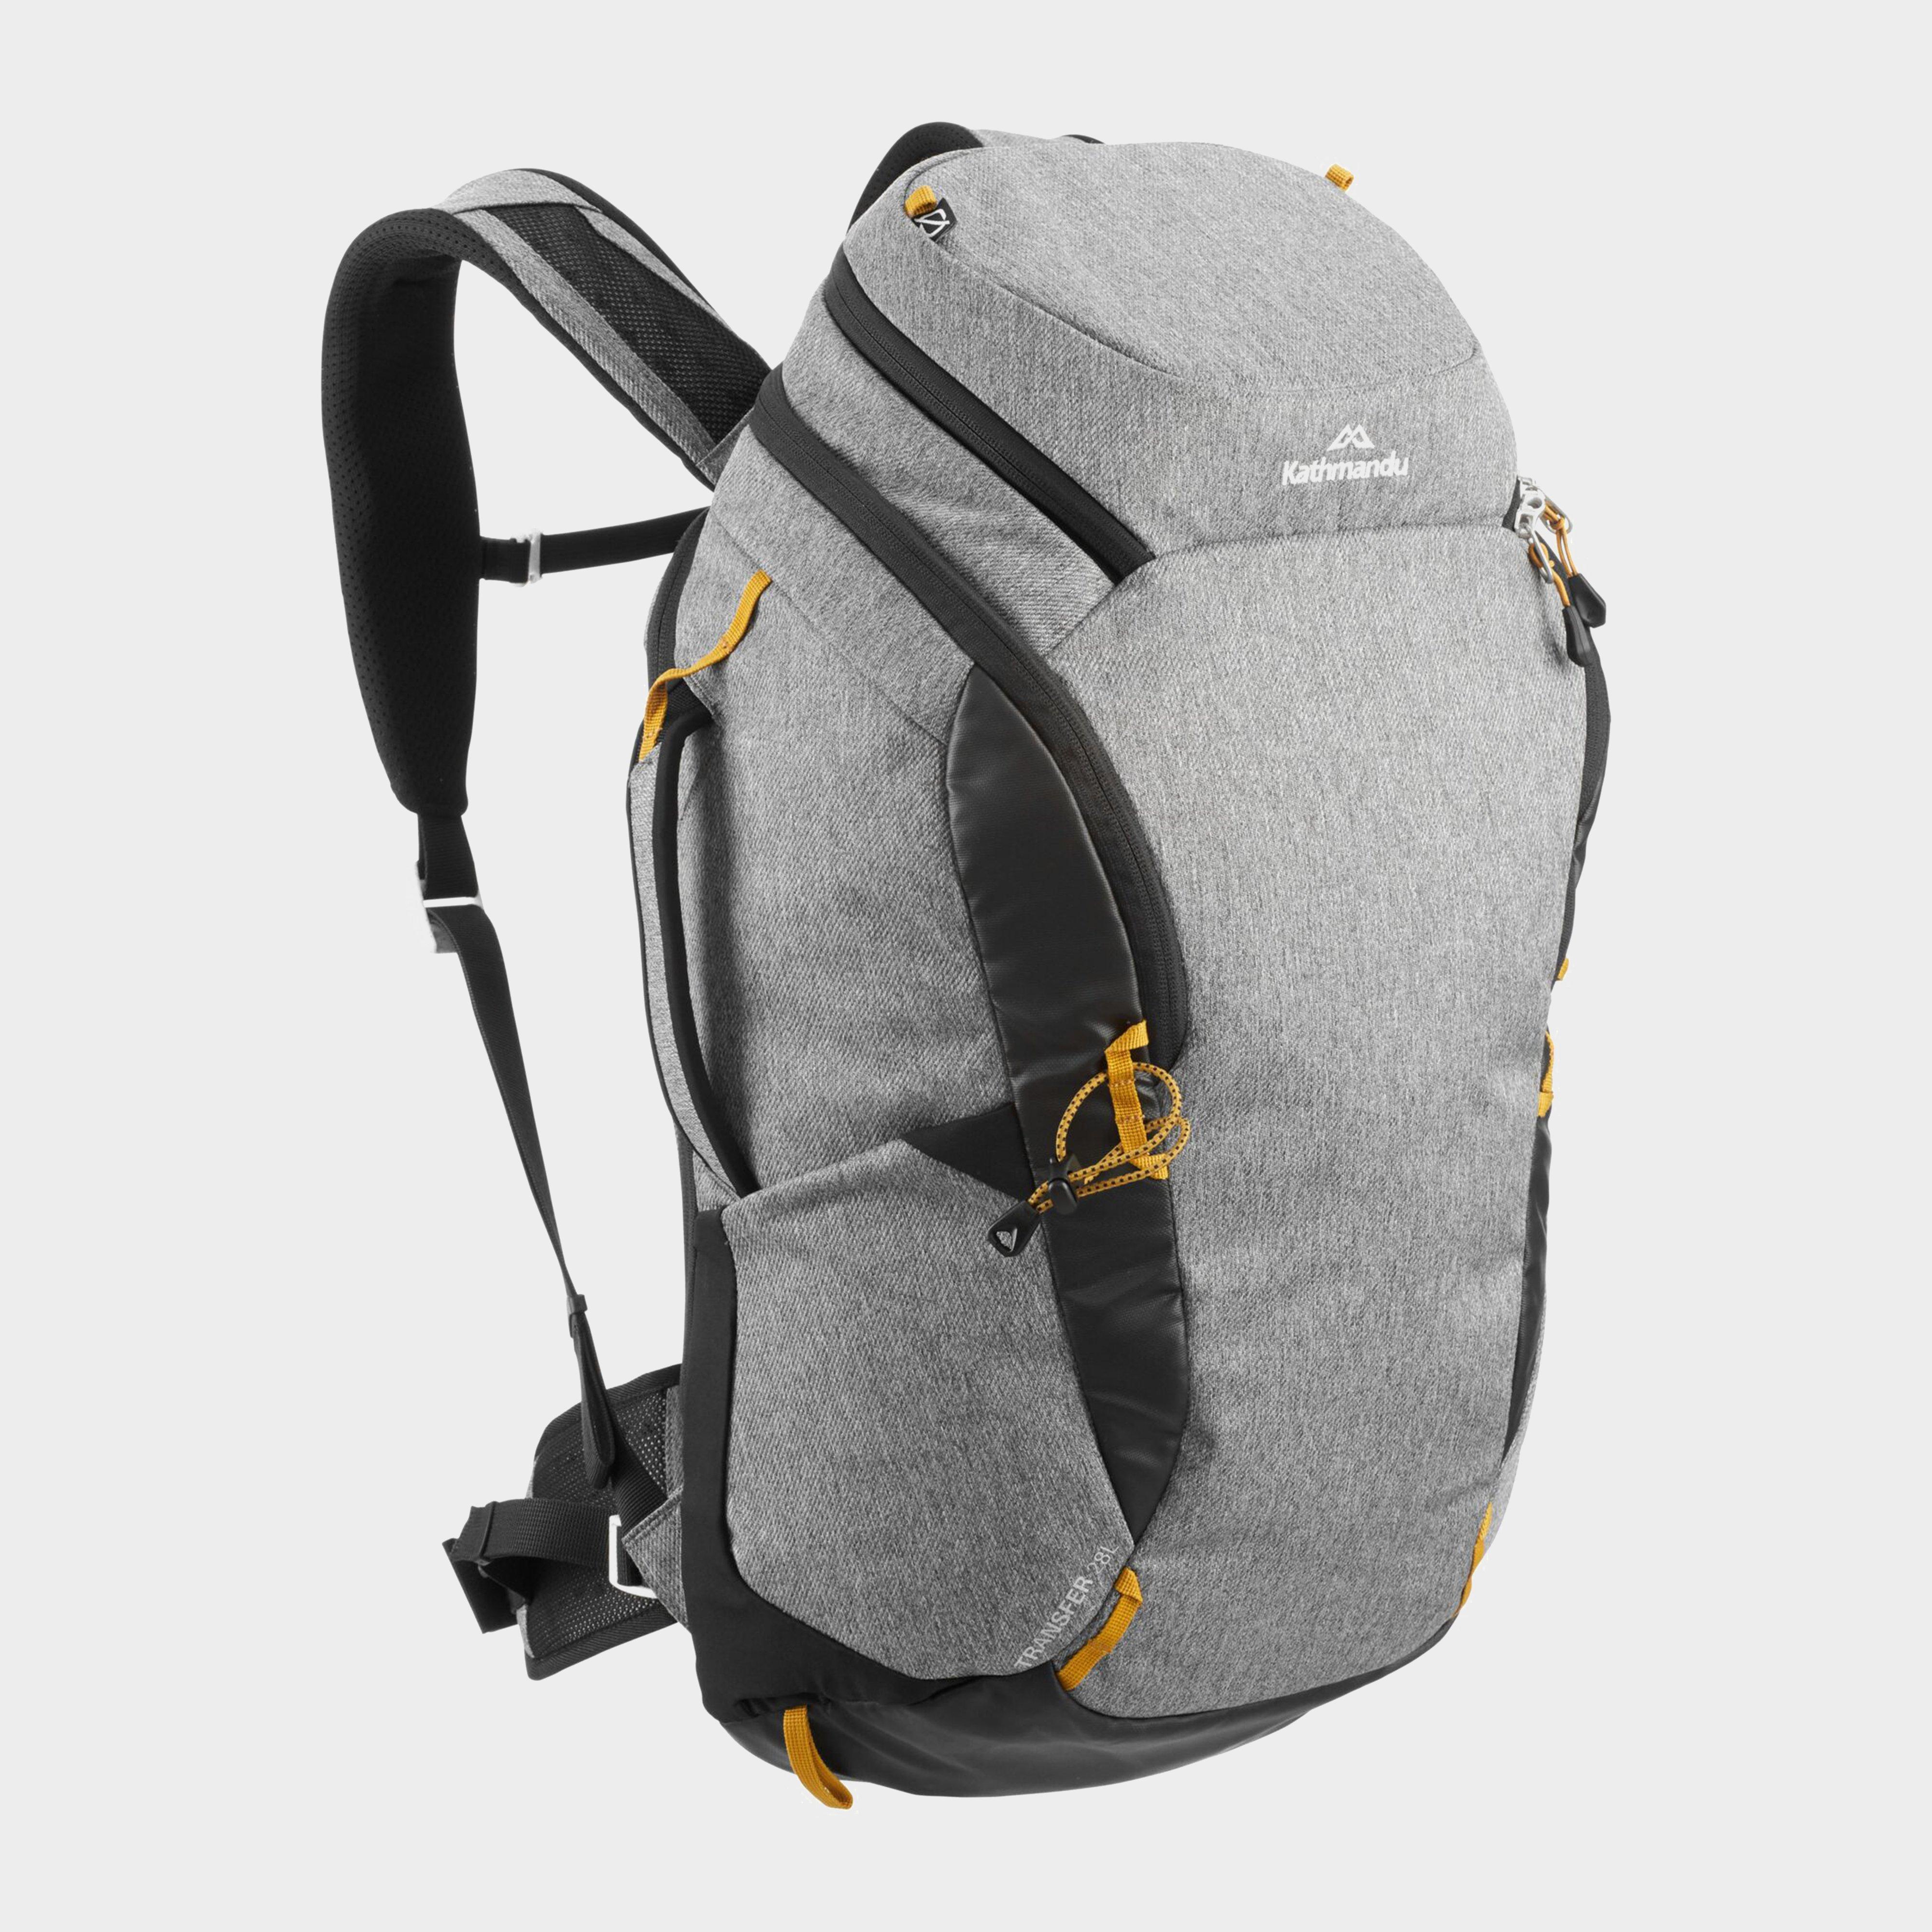 Kathmandu Transfer Pack 28L, Grey